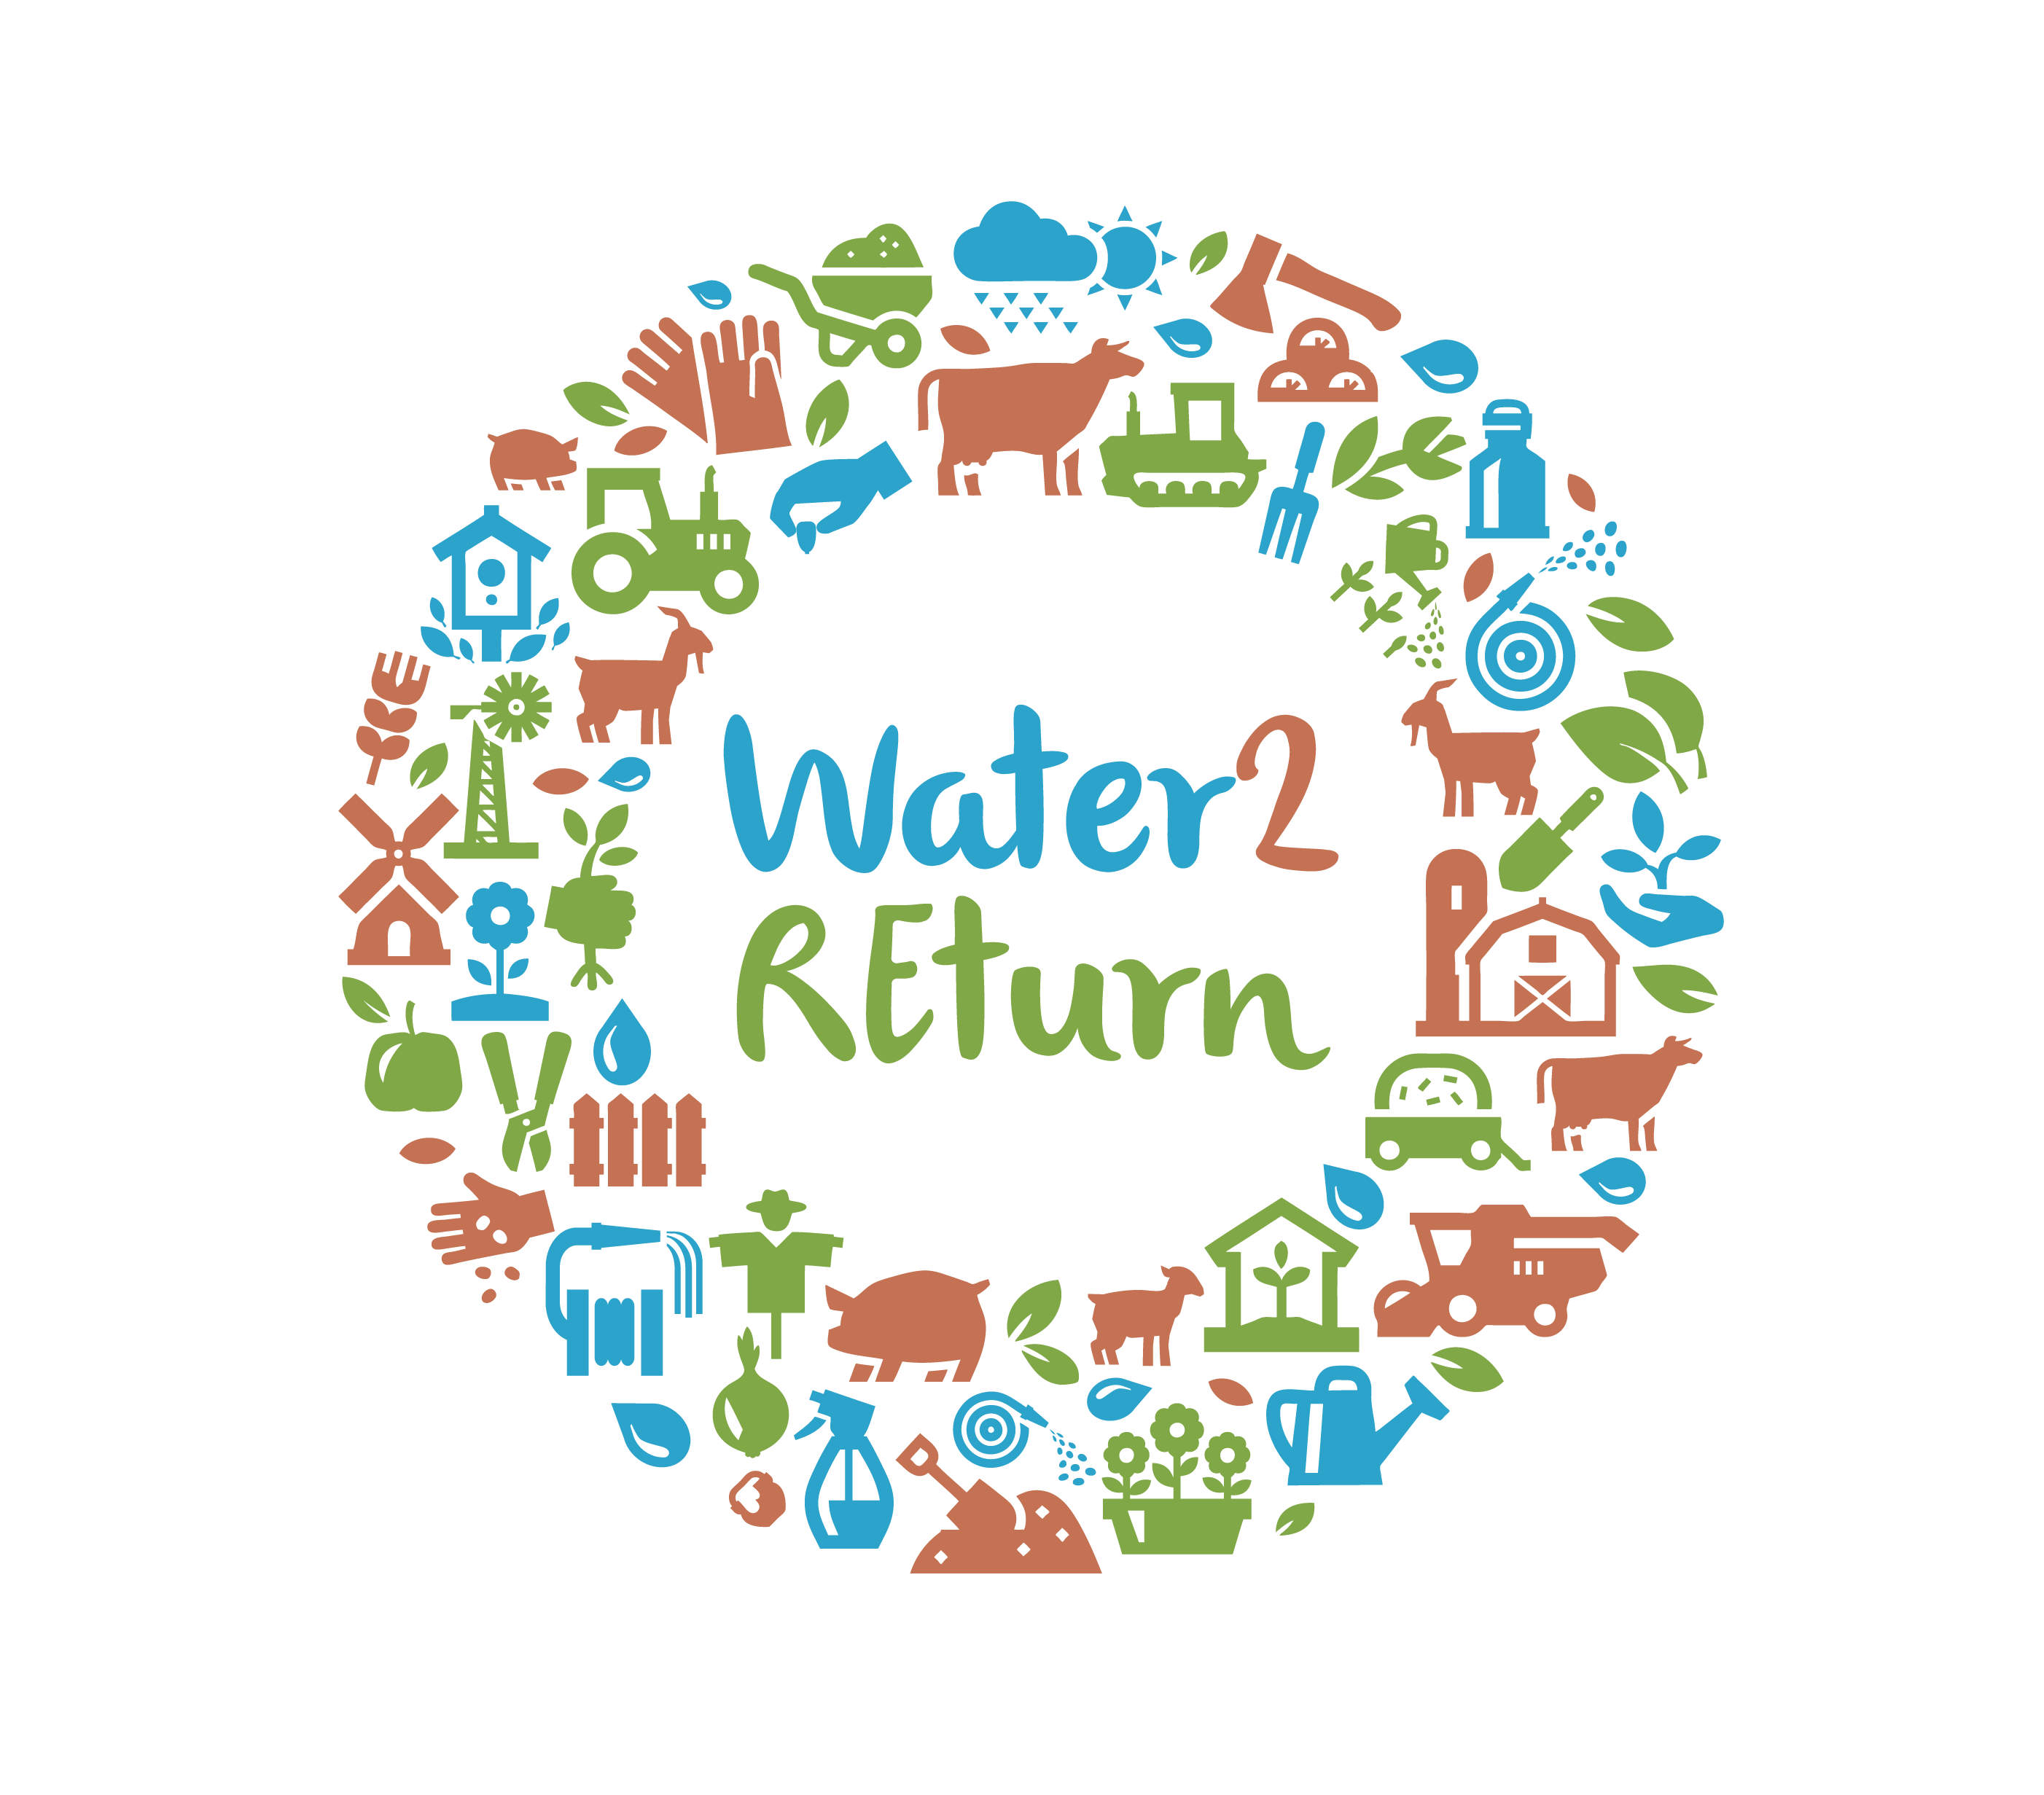 WATER2RETURN